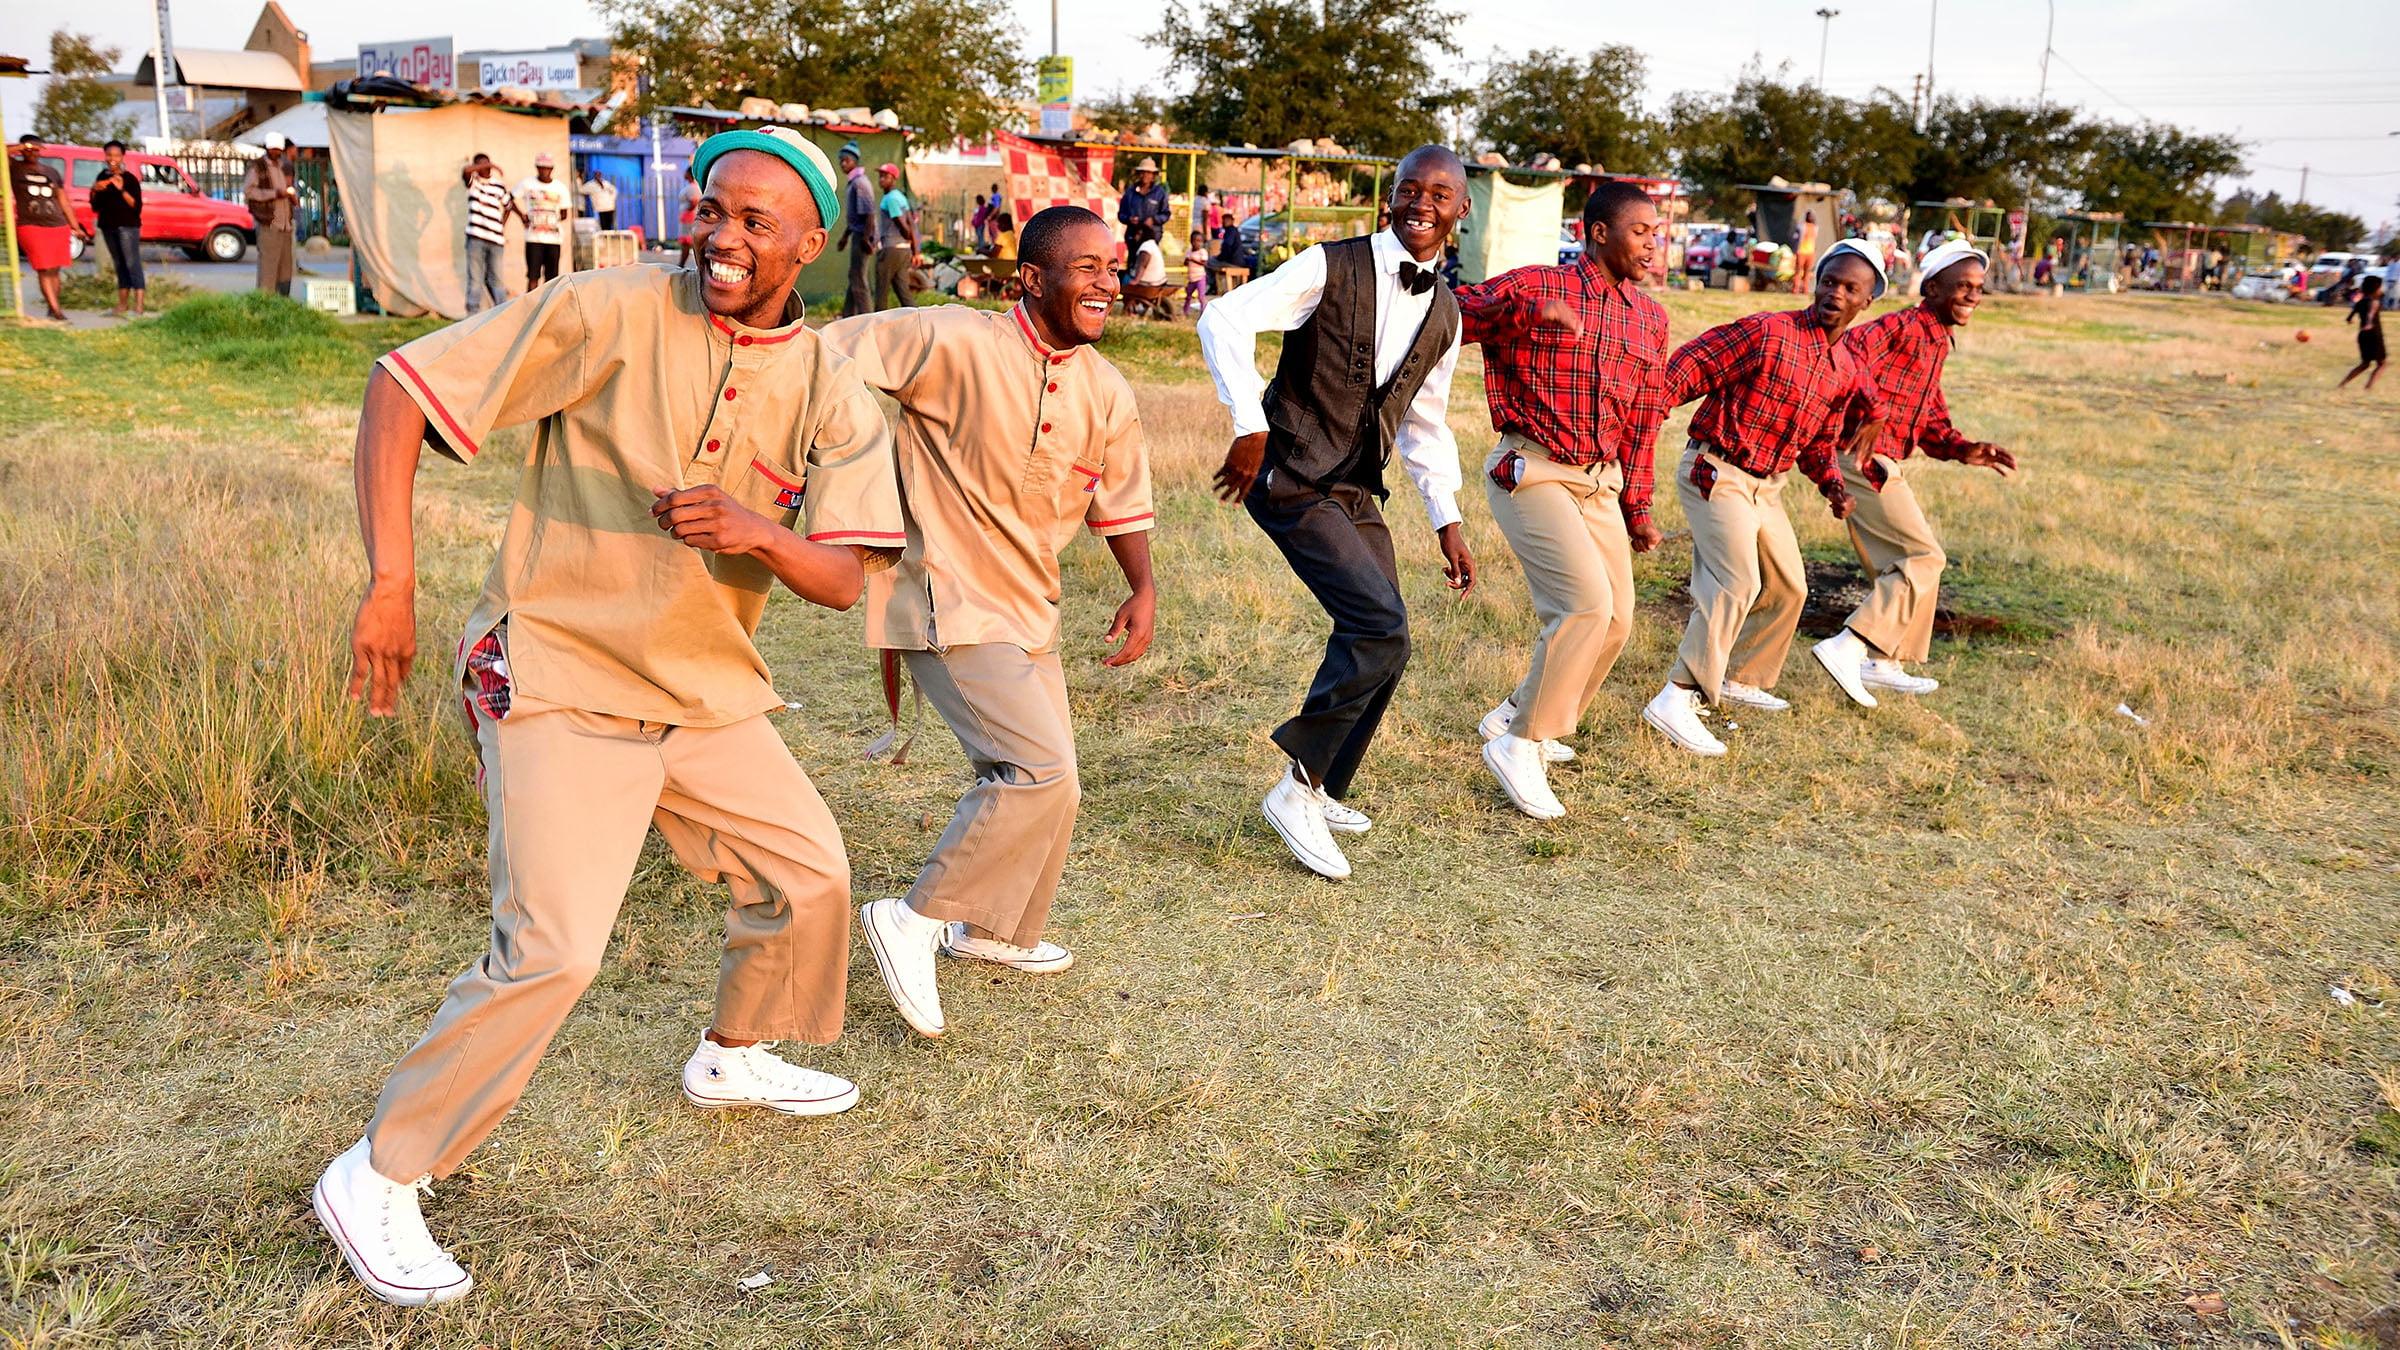 Musica africana en Festivales